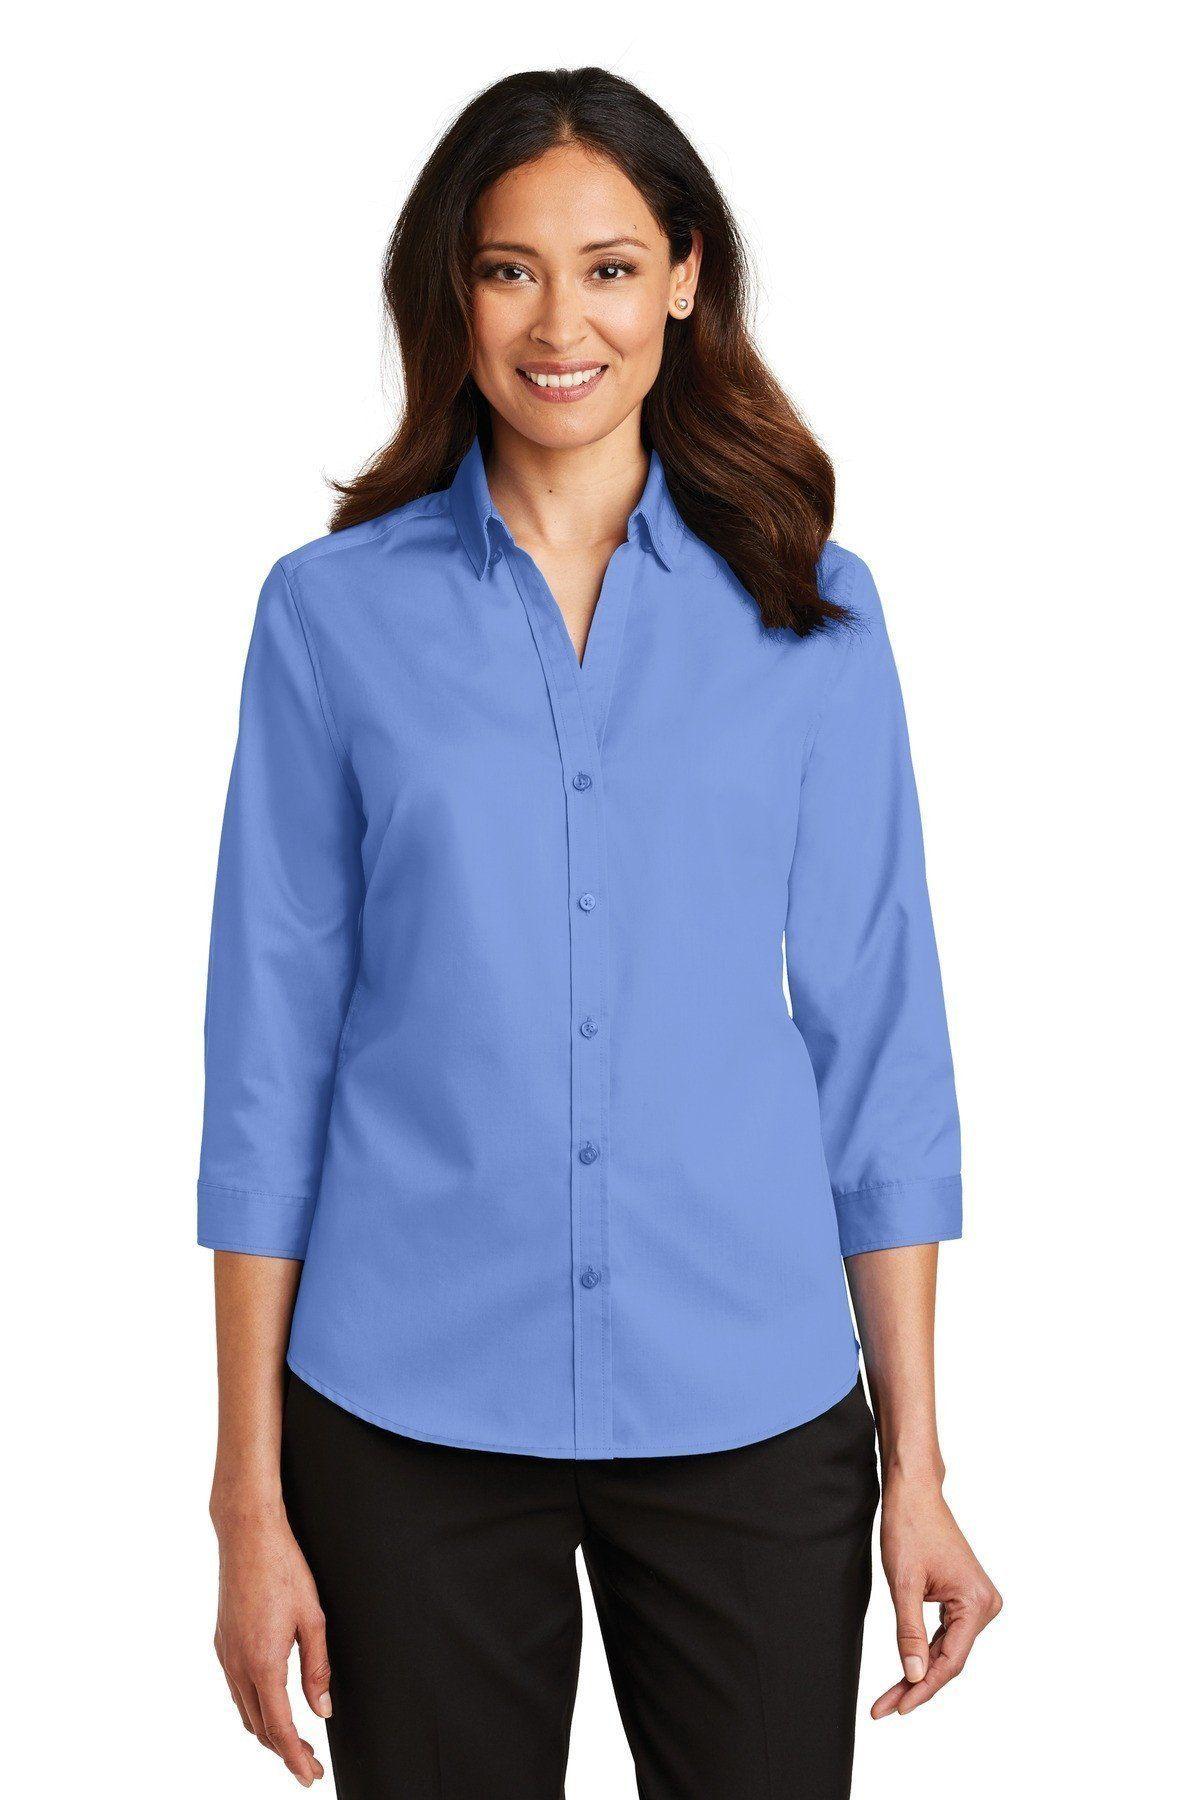 98934f4b6 Port Authority Ladies 3/4-Sleeve SuperPro Twill Shirt Ultramarine Blue L665